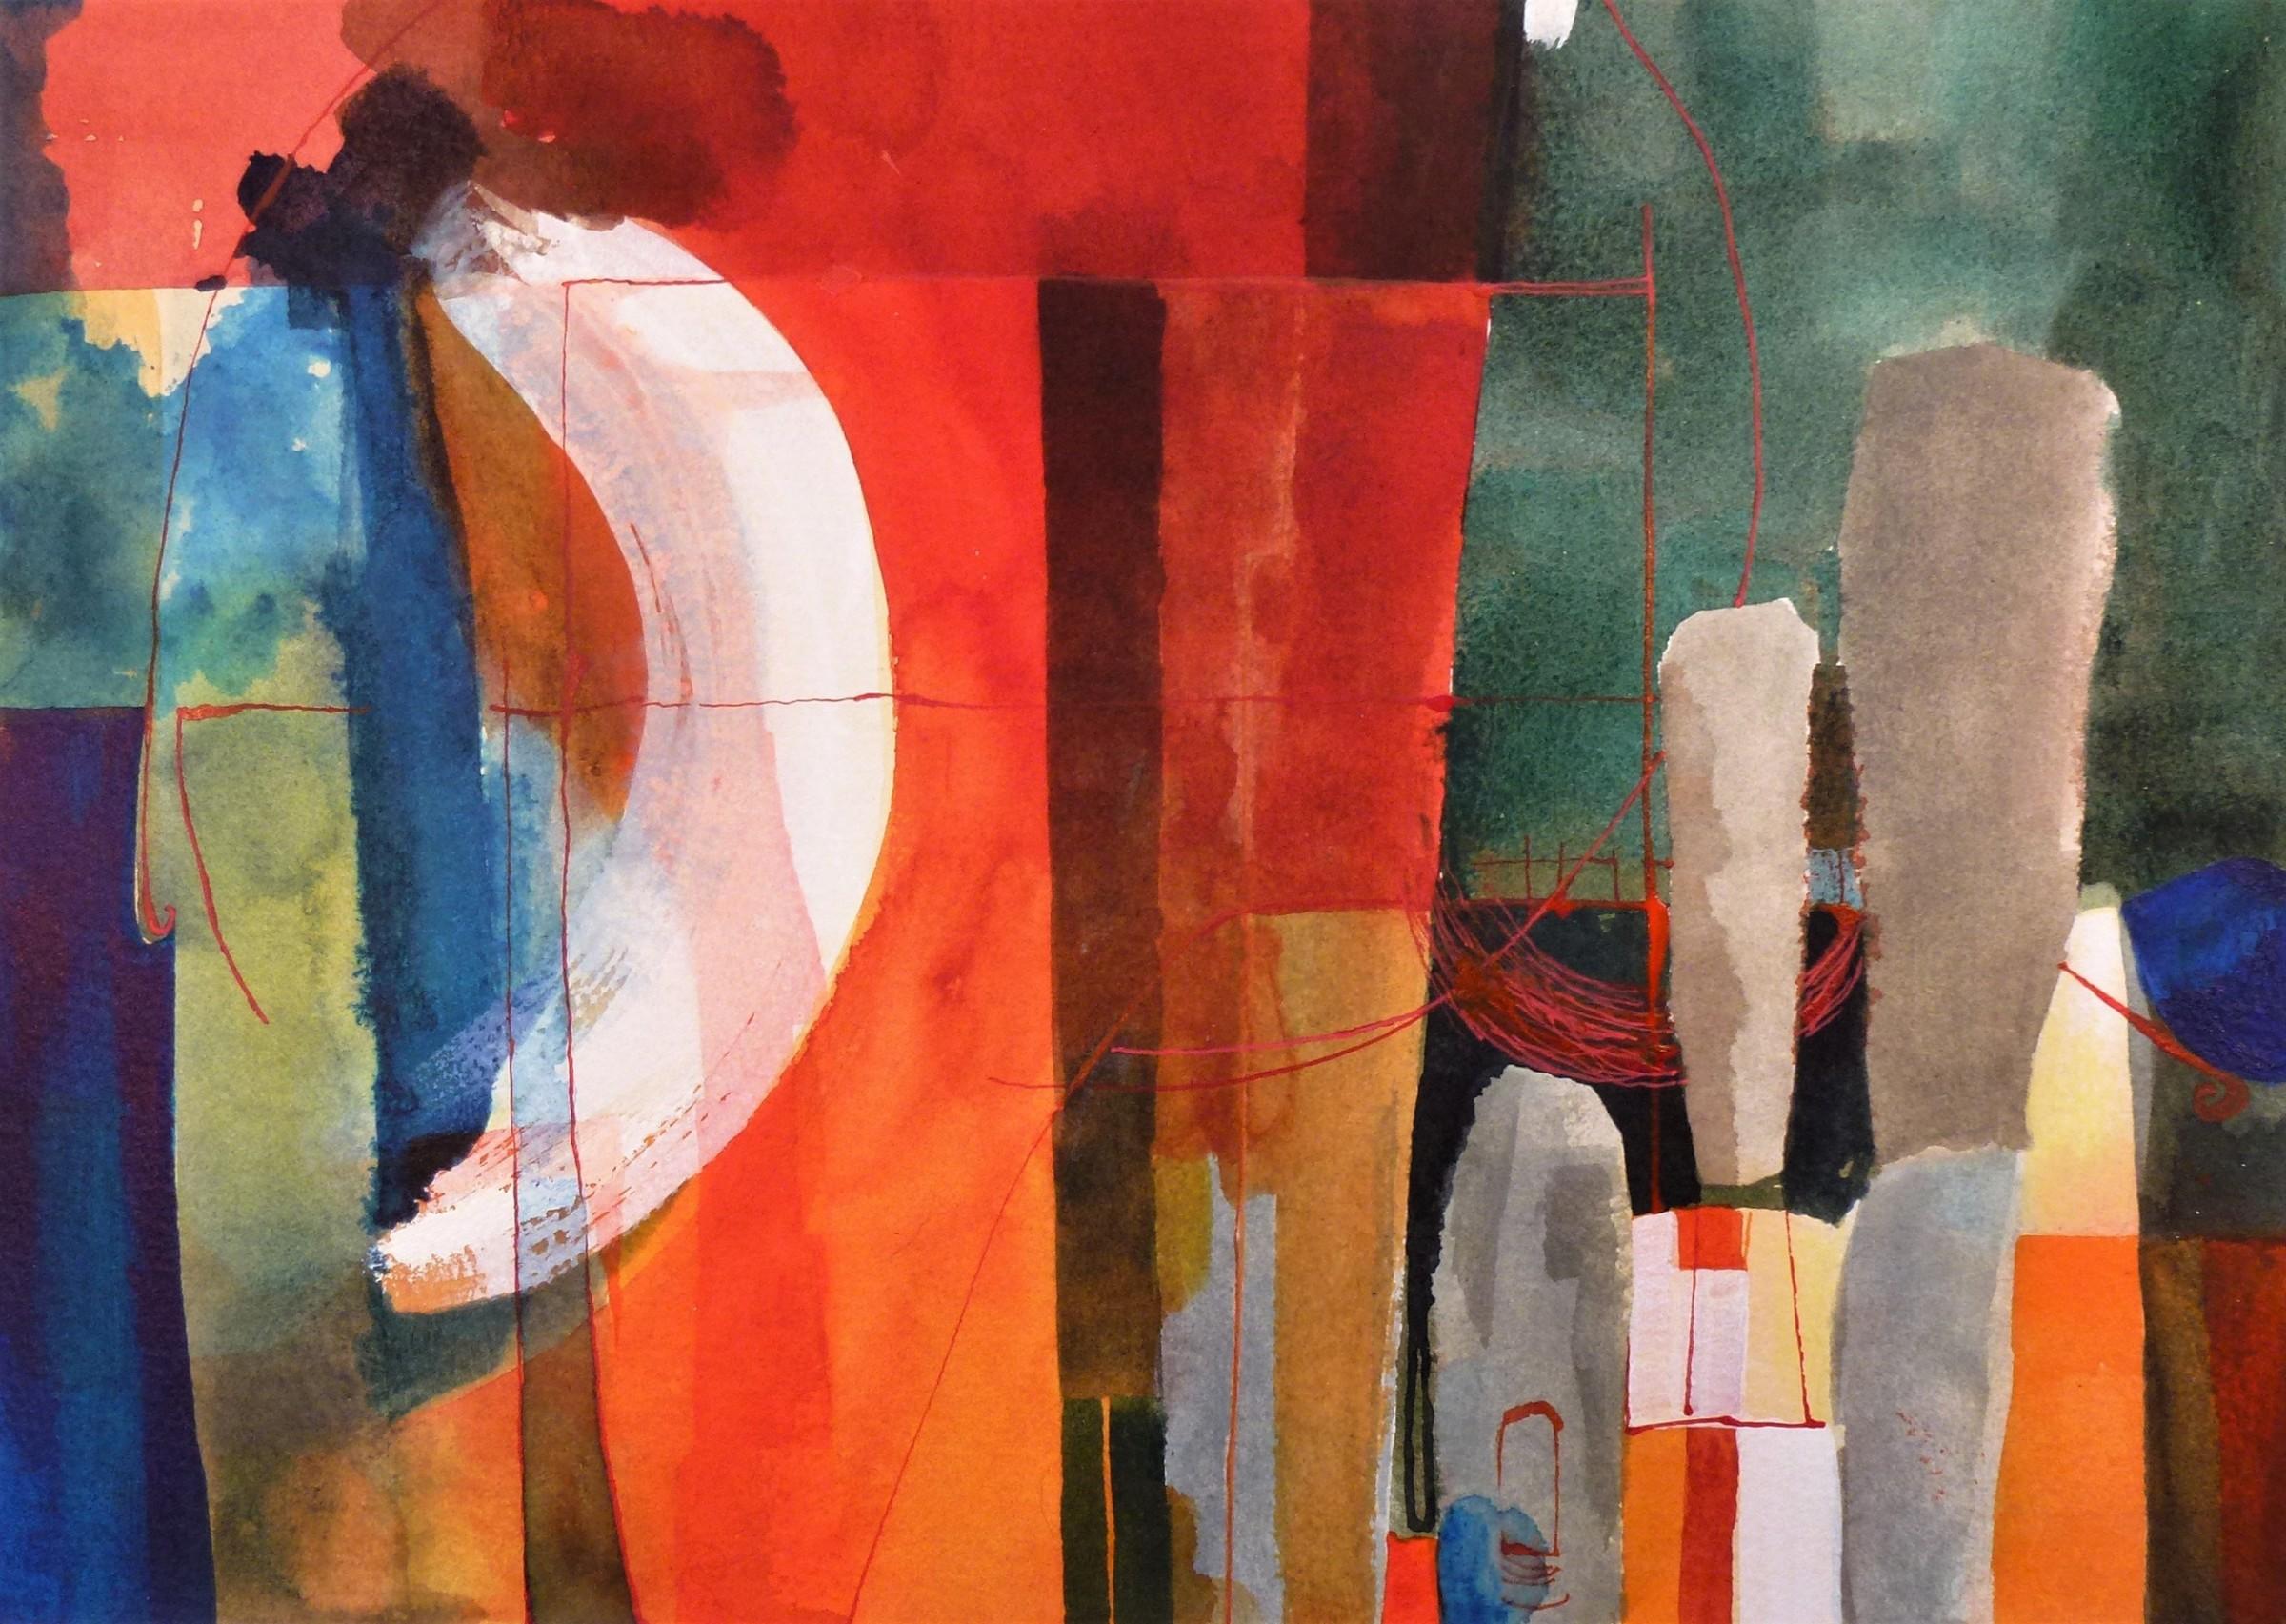 "<span class=""link fancybox-details-link""><a href=""/artists/315-claire-denny/works/12220-claire-denny-landscape-with-standing-stones/"">View Detail Page</a></span><div class=""artist""><span class=""artist""><strong>Claire Denny</strong></span></div><div class=""title""><em>Landscape with Standing Stones</em></div><div class=""medium"">watercolour & ink</div><div class=""dimensions"">Frame: 46 x 57 cm<br /> Artwork: 26 x 37 cm</div><div class=""price"">£495.00</div>"